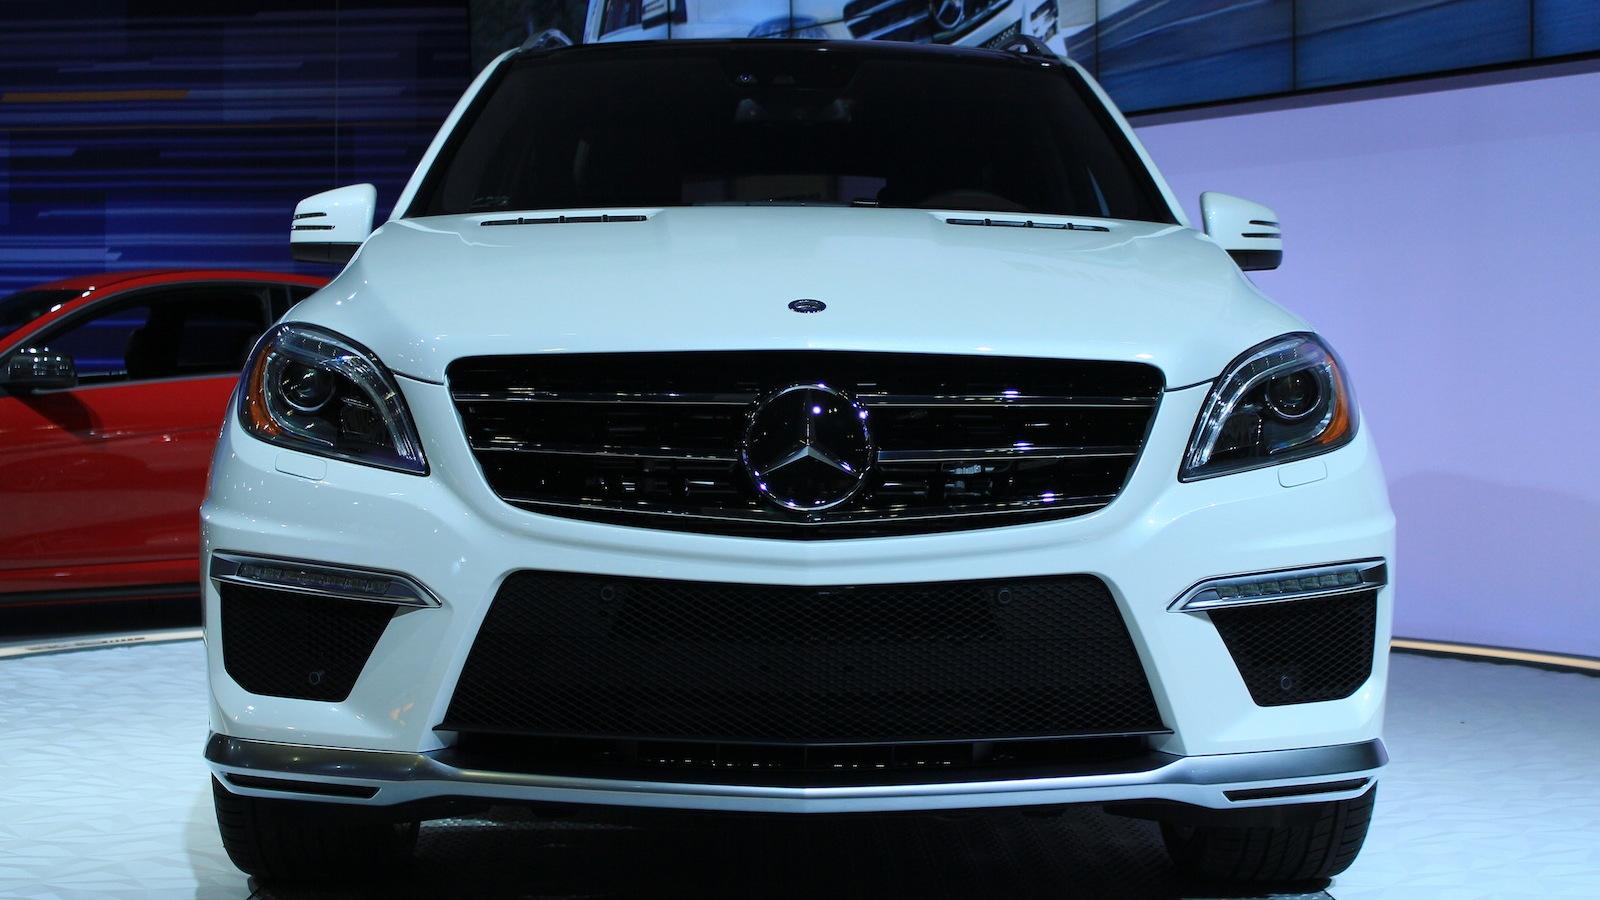 2012 Mercedes-Benz ML 63 AMG live photos